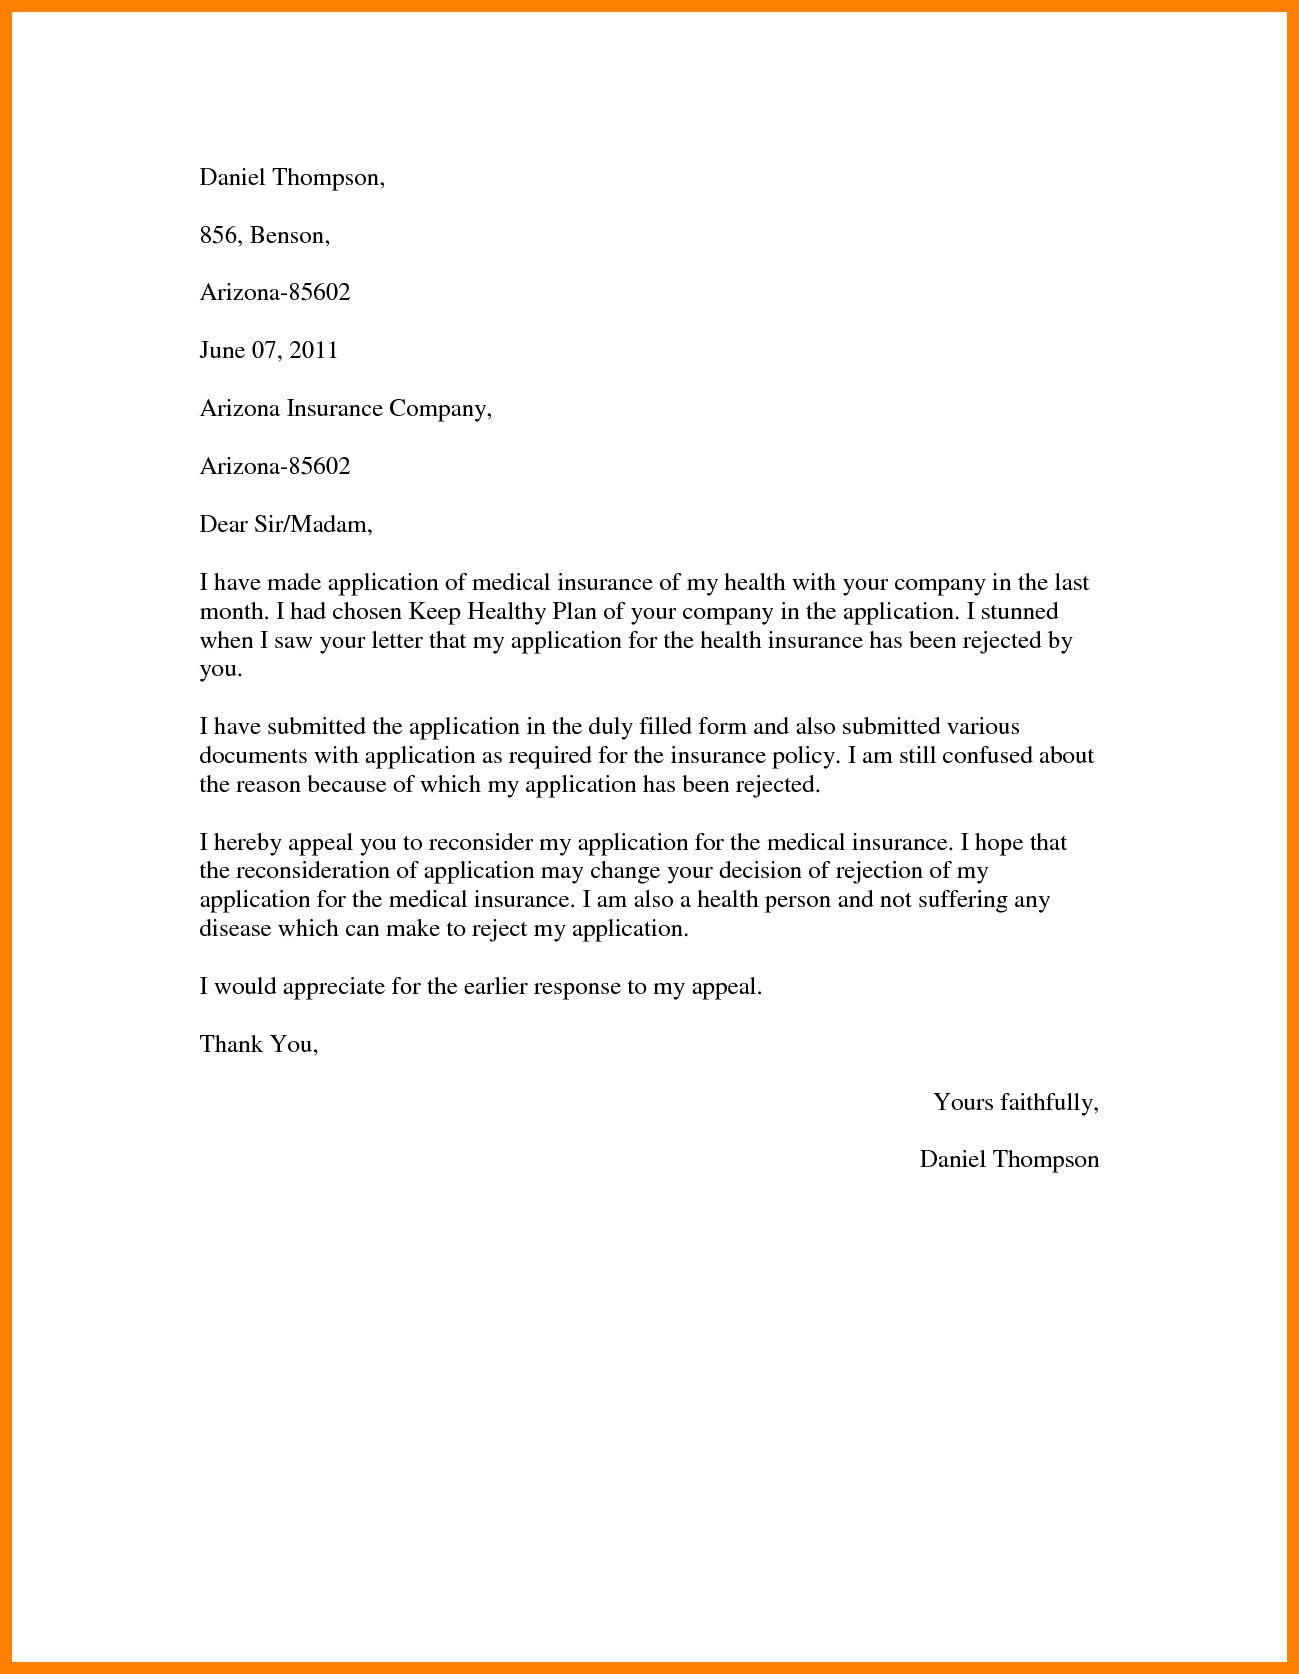 Appeal Letter Sample Denial   Sample Resume Alif with ...